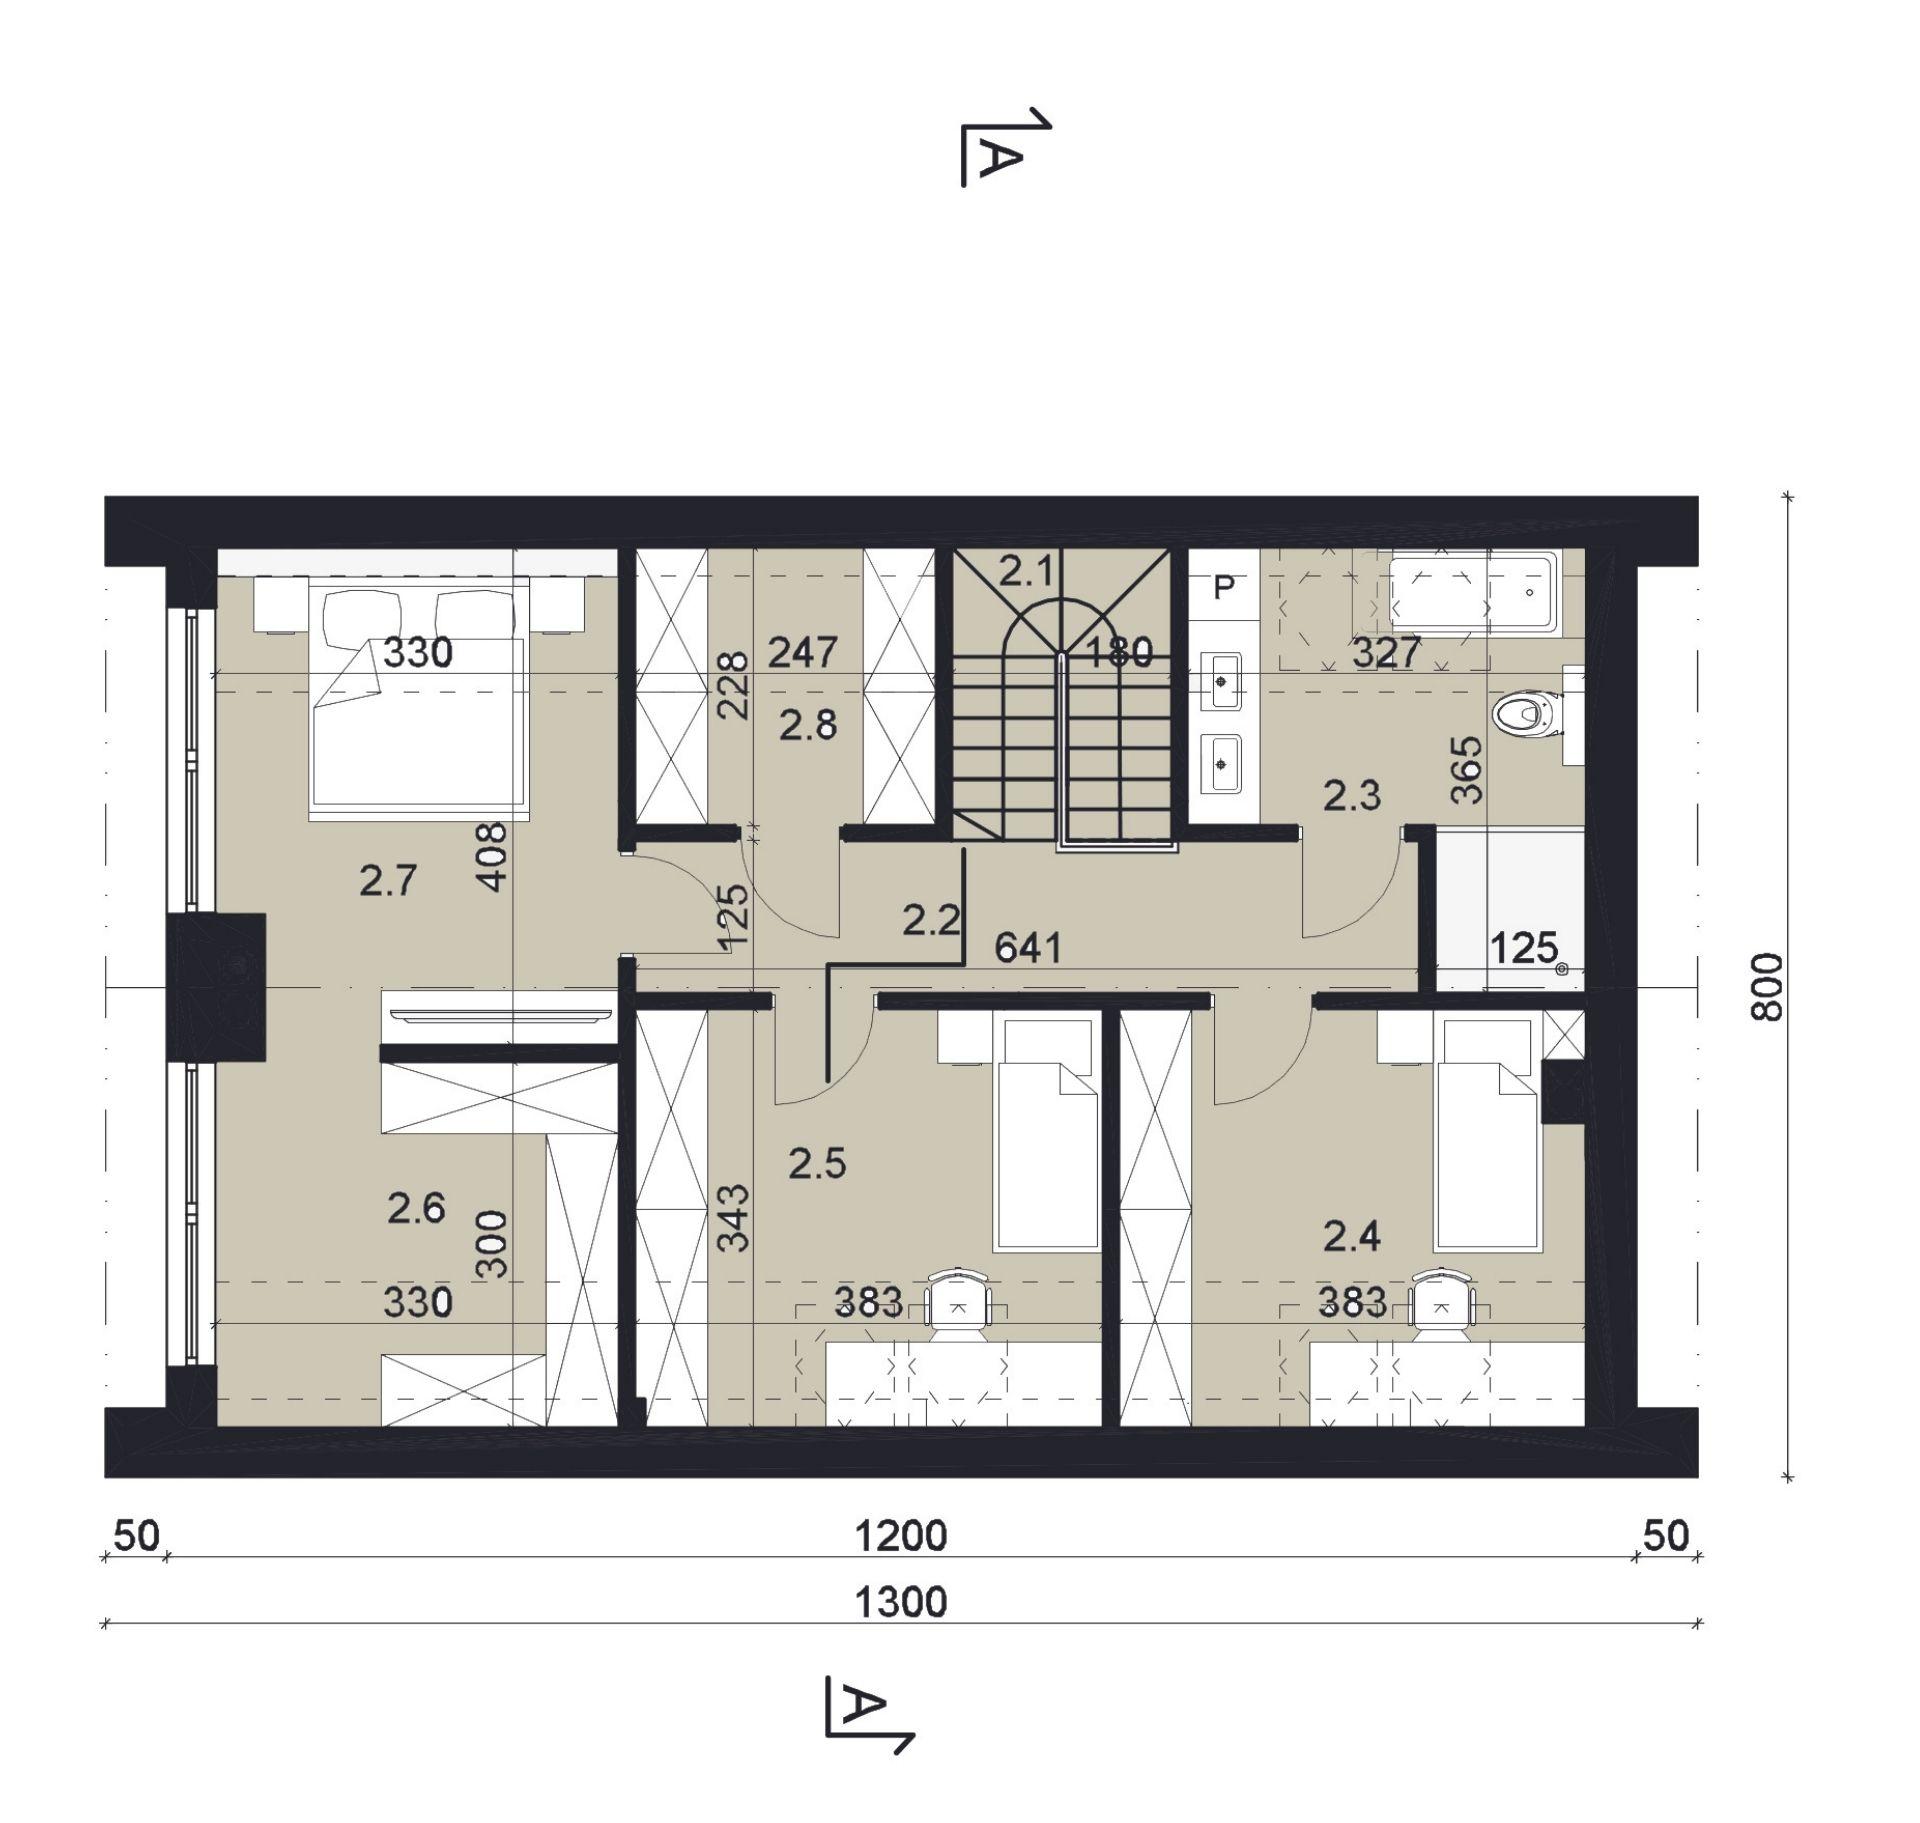 RZUT PODDASZA - projekt domu SEJ-PRO 074 ENERGO